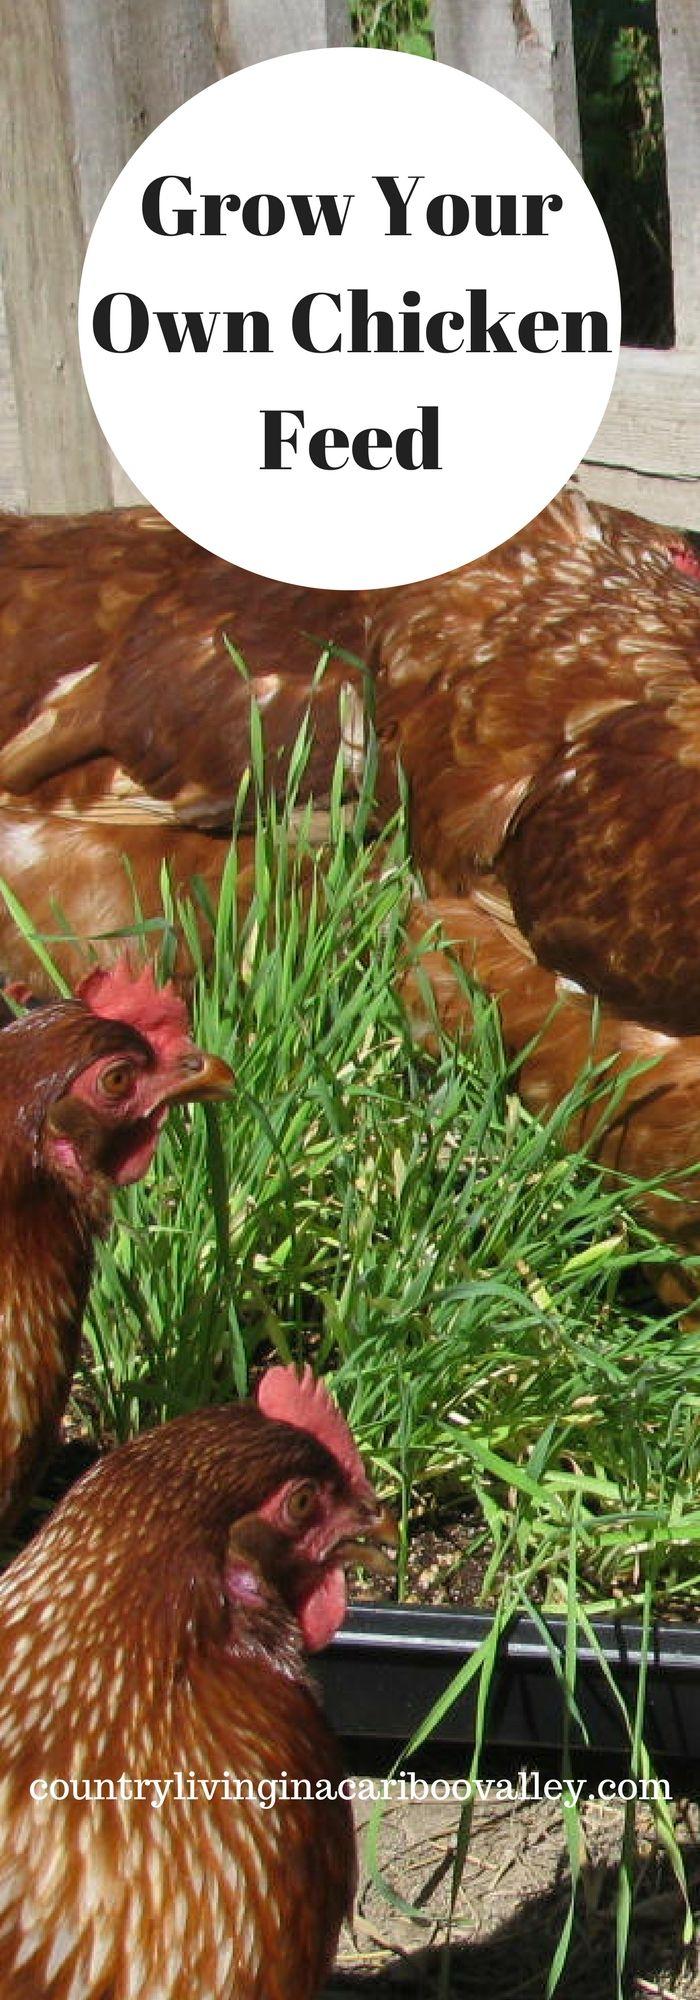 299 best chicken duck coops images on pinterest raising chickens